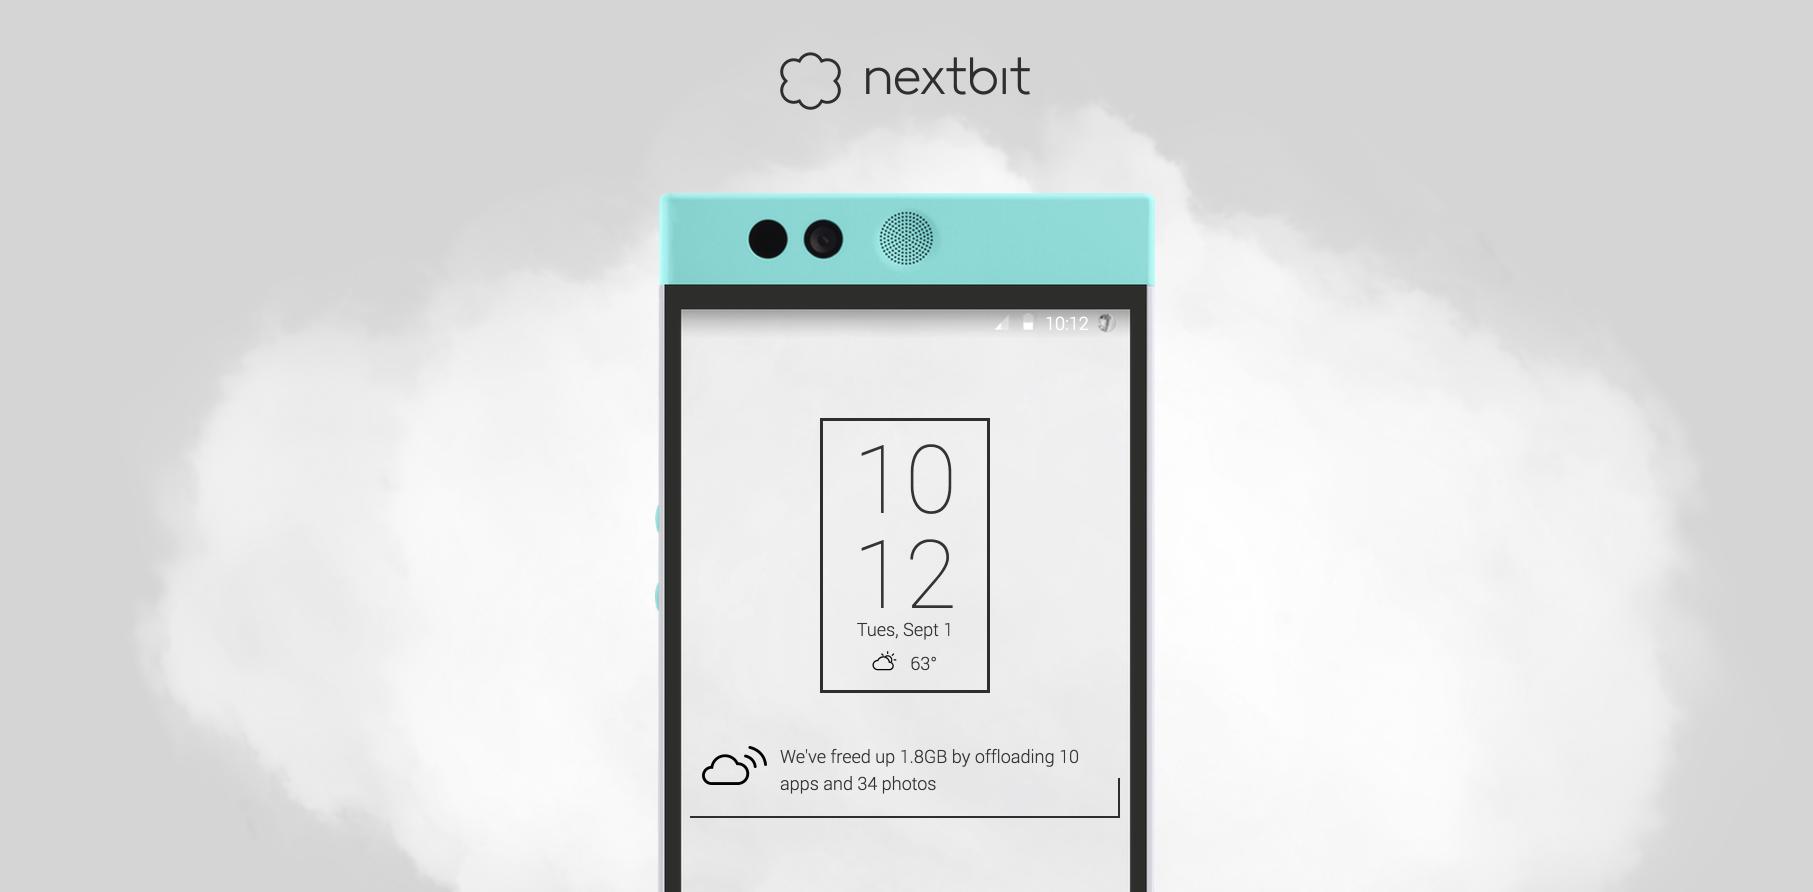 Nextbit 2015-09-01 10-12-59